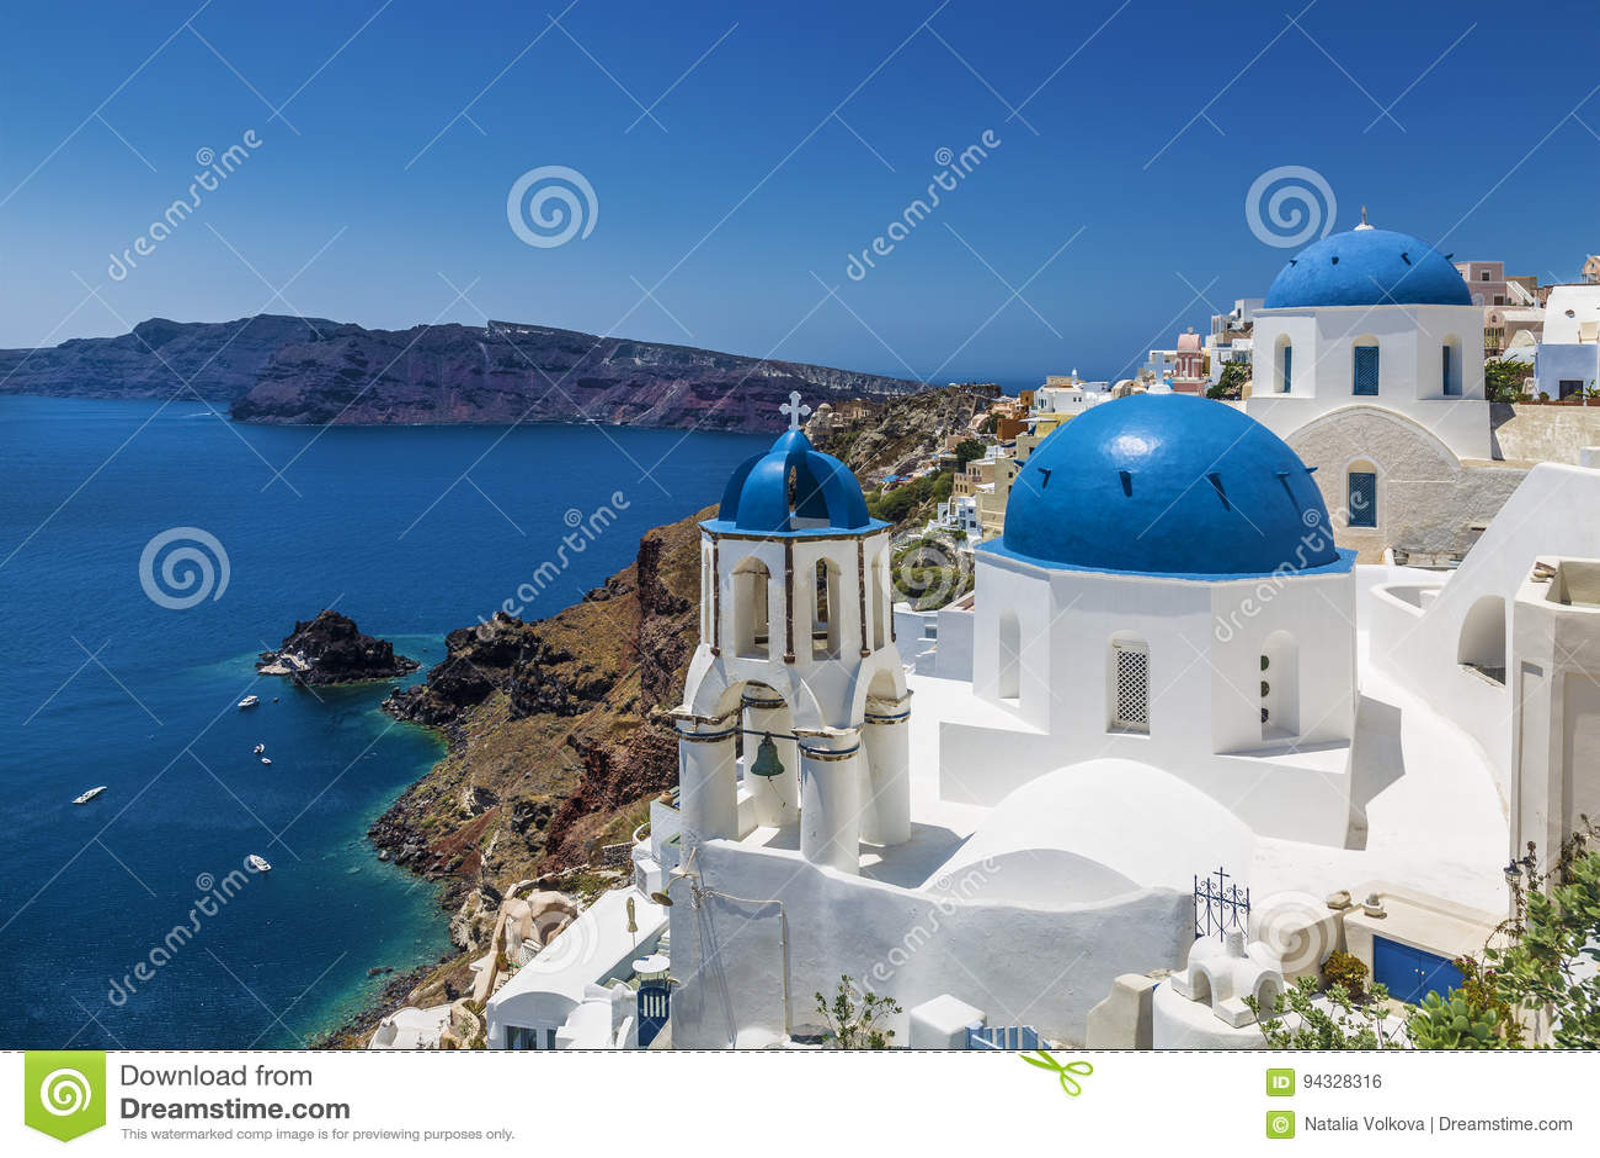 Blue domed churches in the village of Oia, Santorini Thira, Cyclades Islands, Aegean Sea,